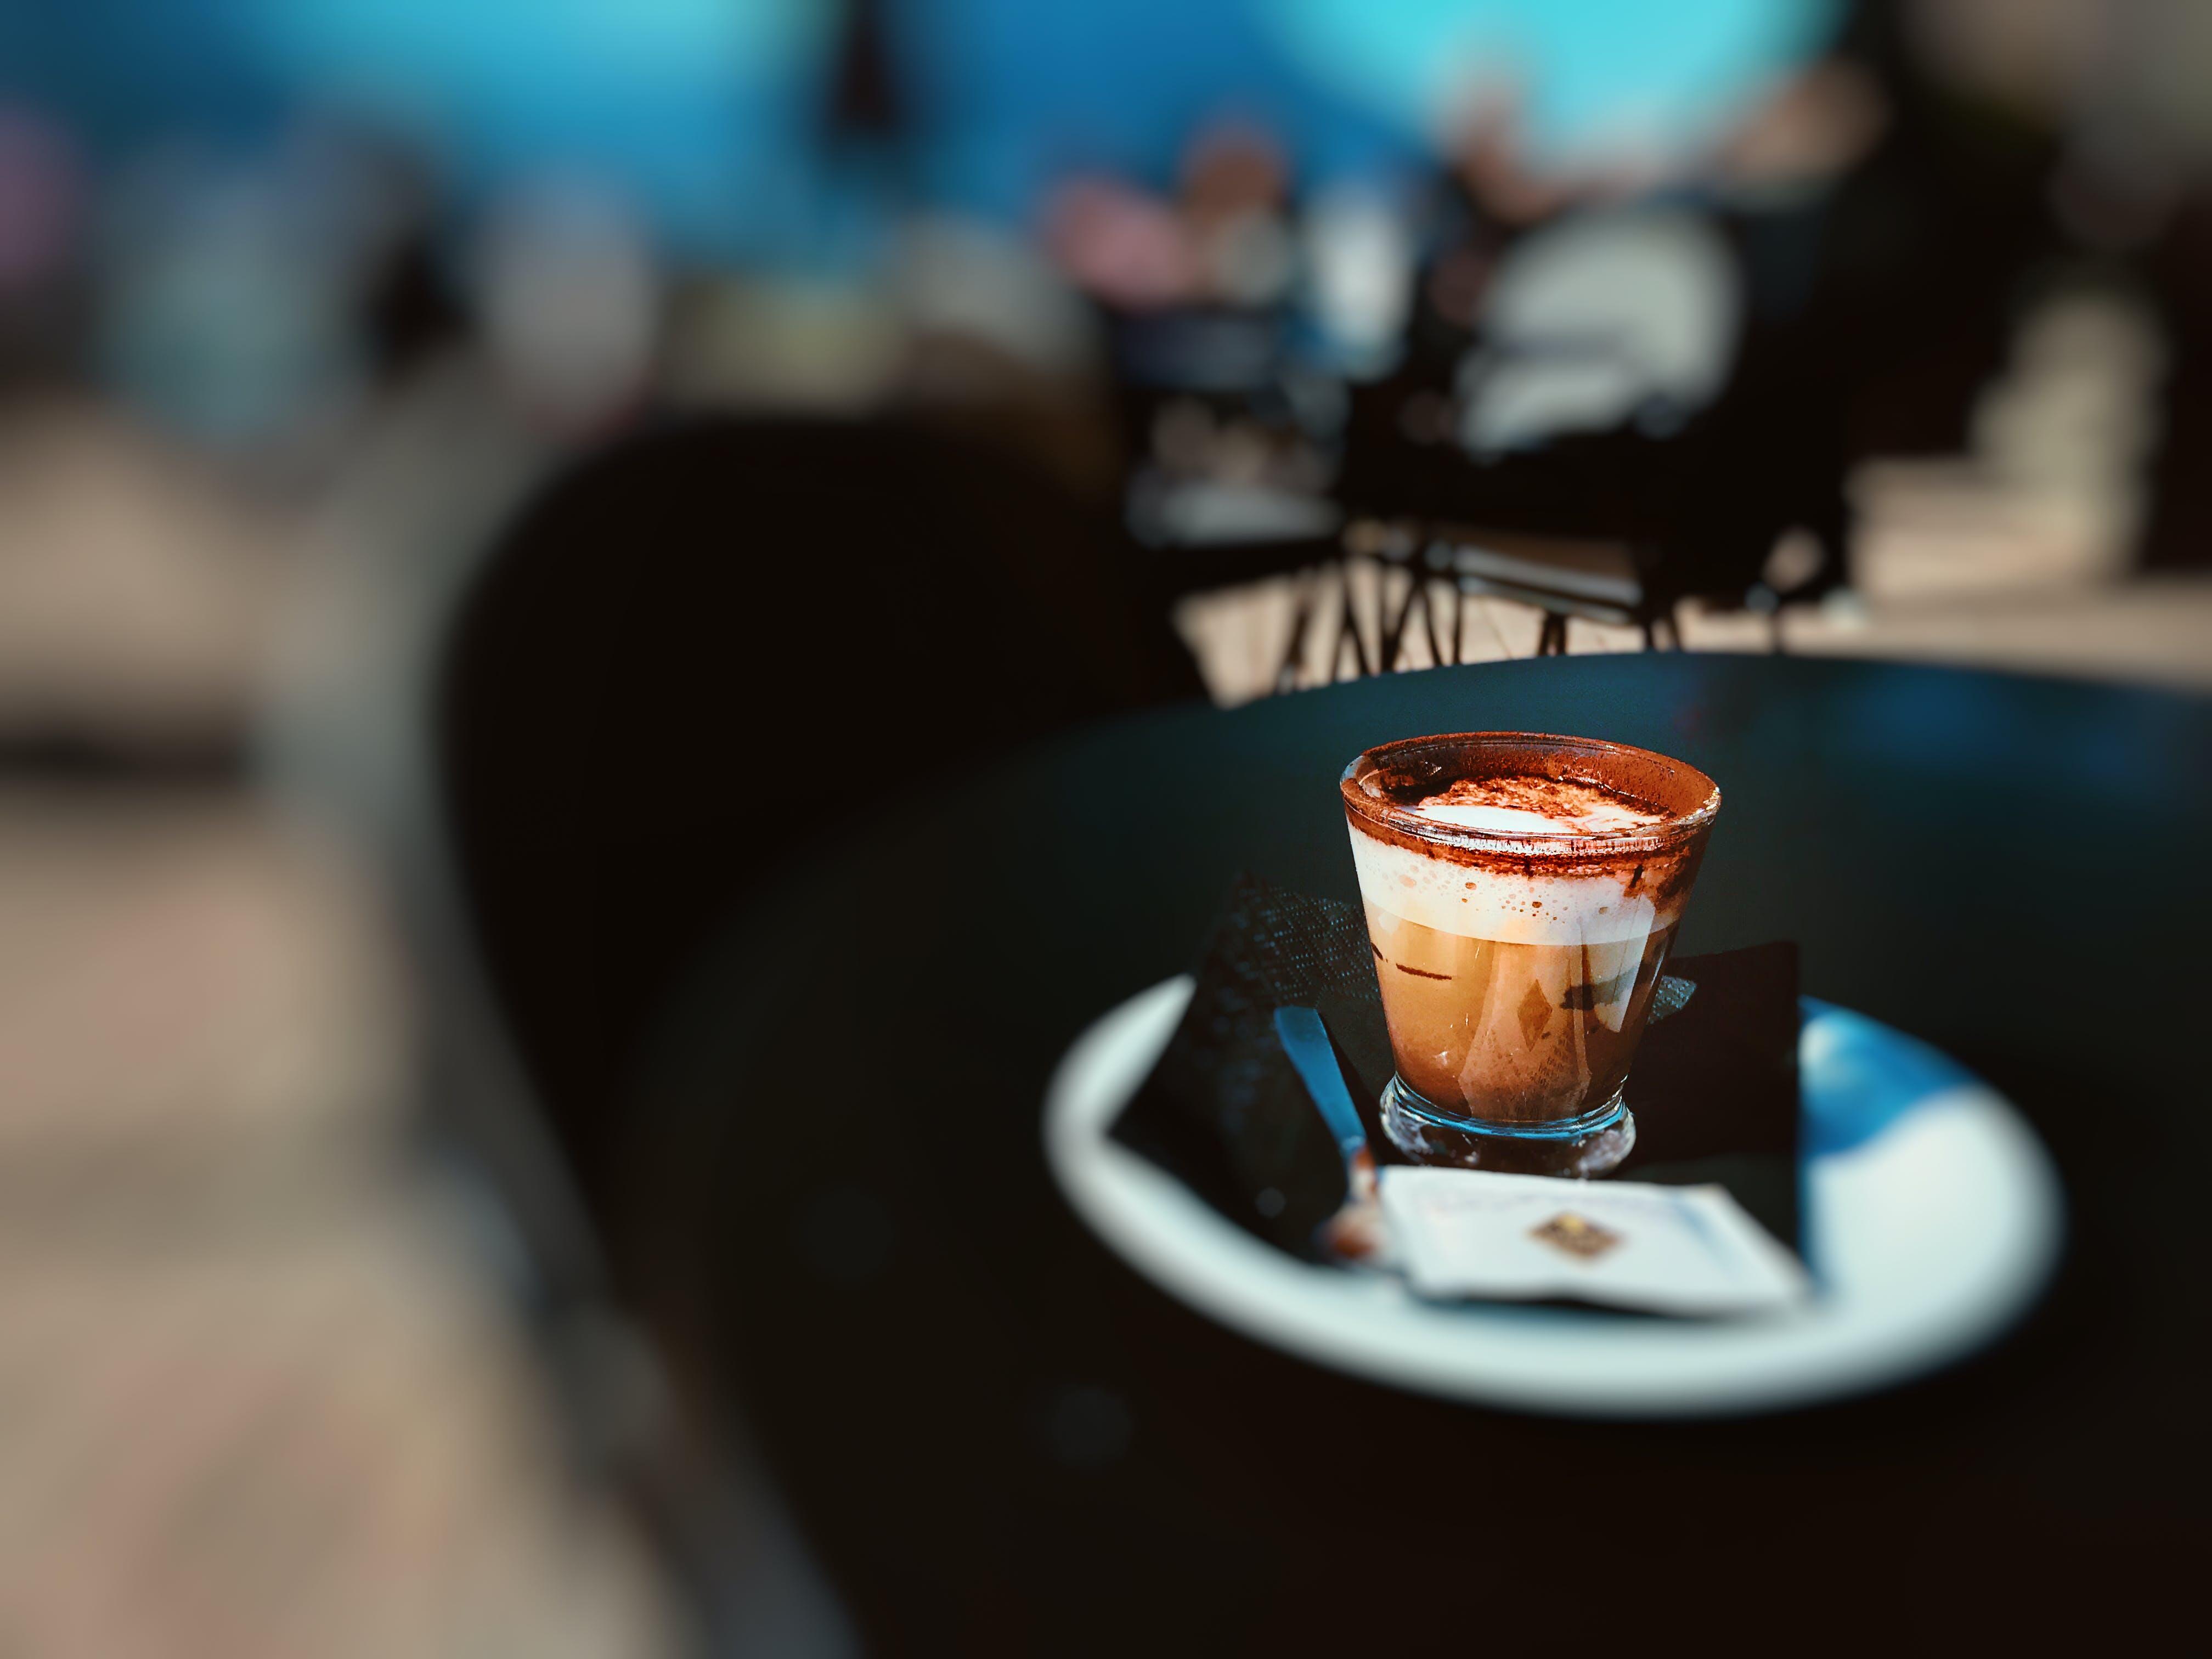 Fotos de stock gratuitas de atractivo, azúcar, beber, café